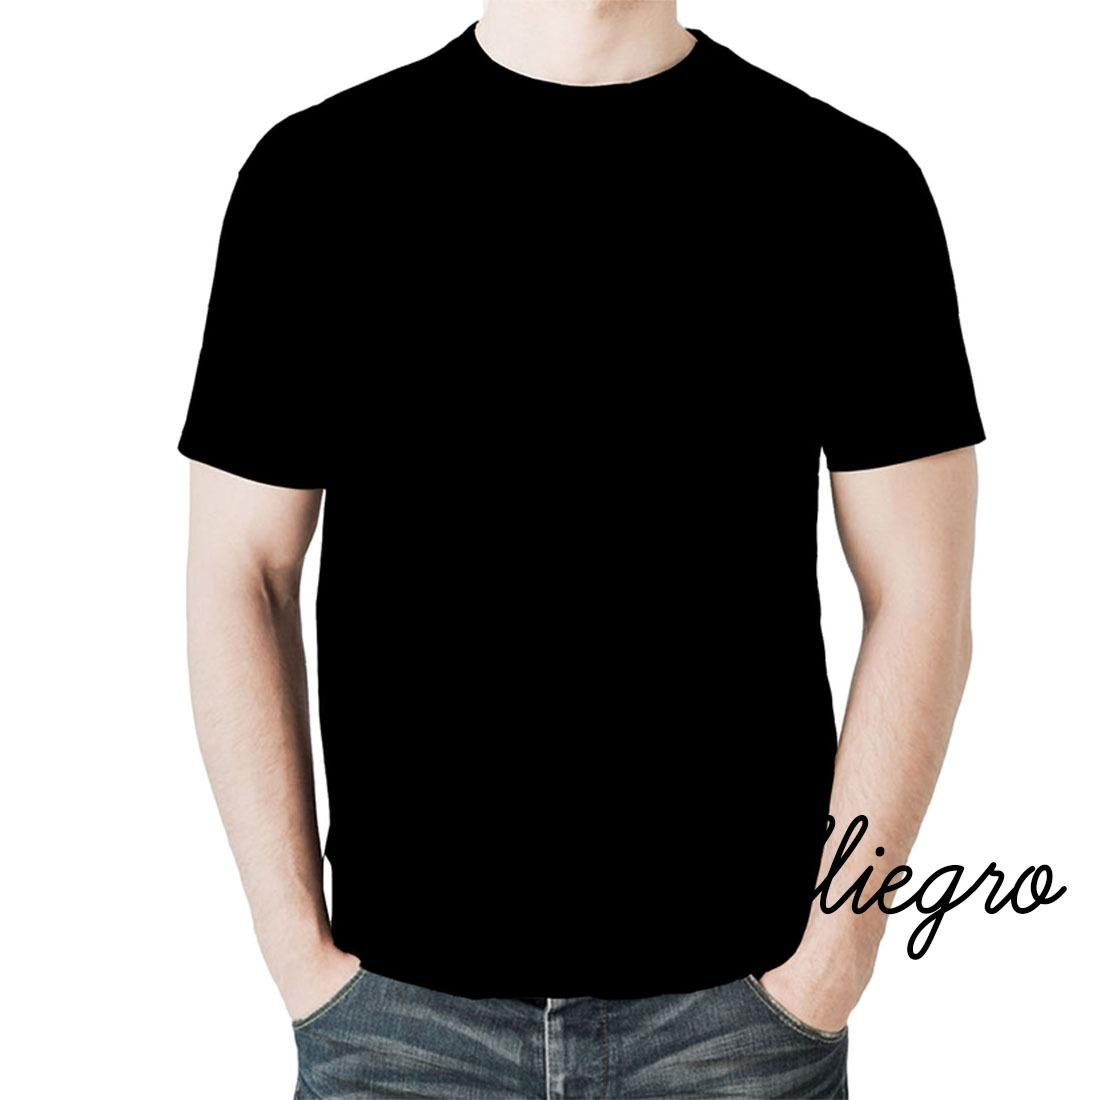 Alliegro Kaos Pria Polos Distro Premium - Kaos Terbaru Keren Murah Tumblr  Tee Dewasa Hitam 52a0c3a588